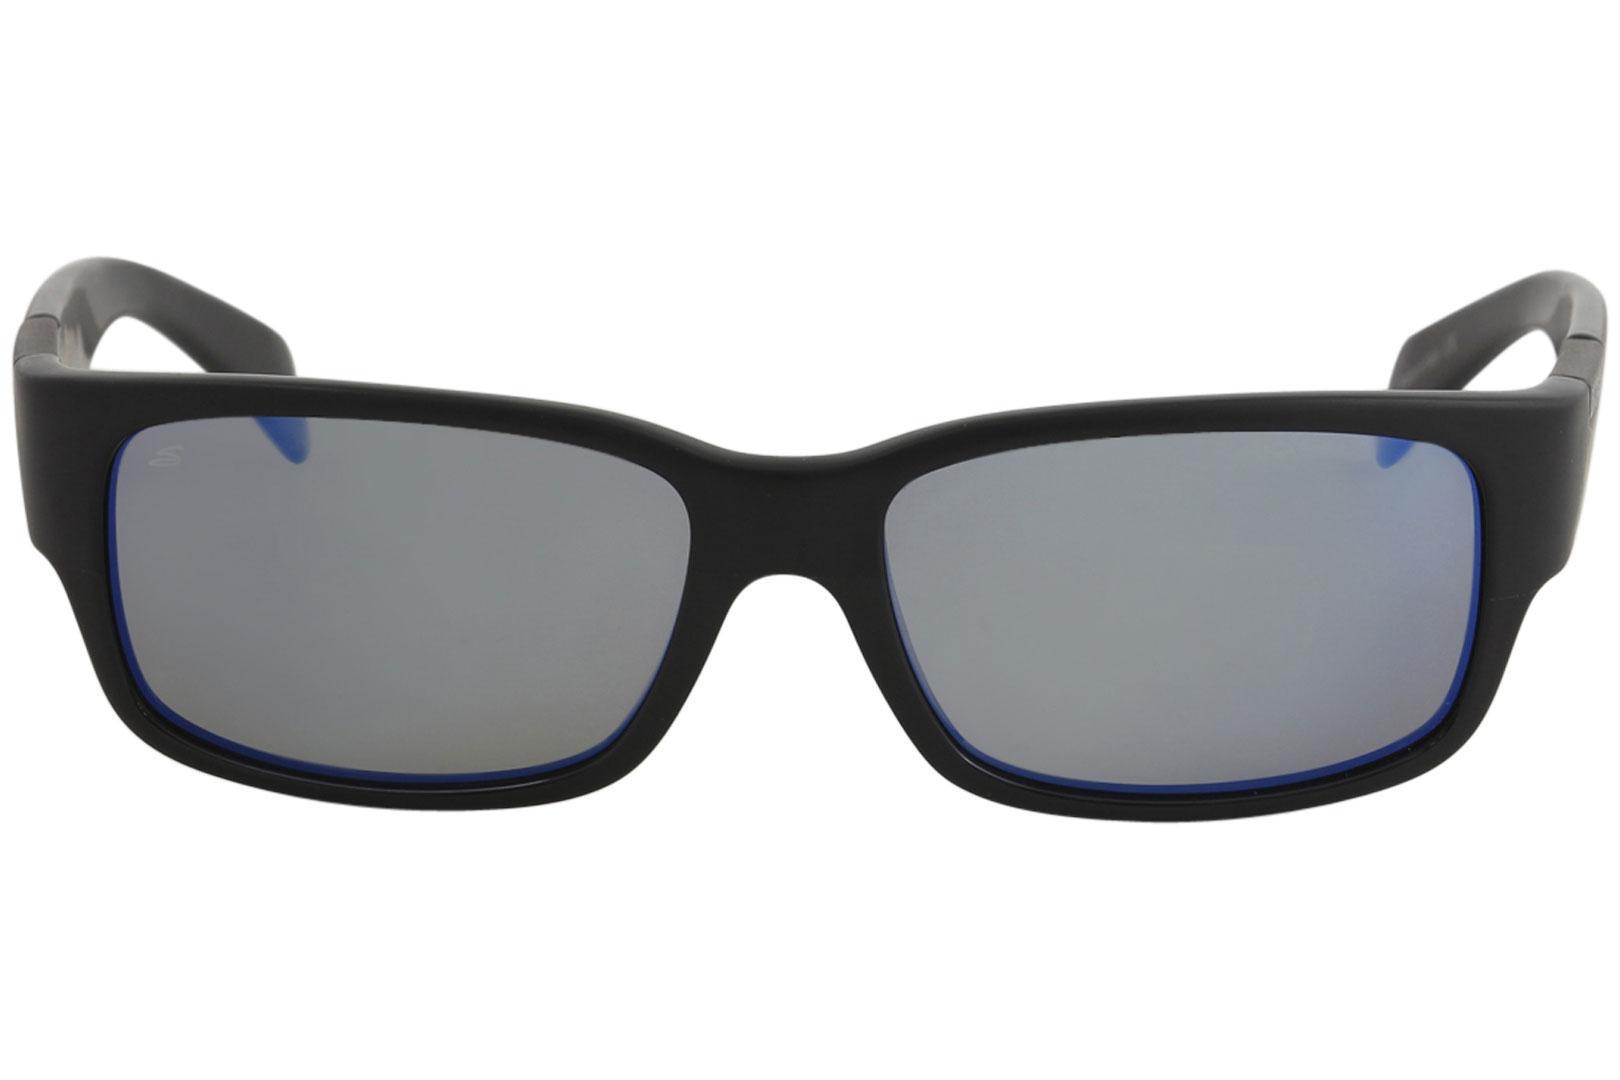 a4b3c11591 Serengeti Men s Merano Fashion Rectangle Polarized Sunglasses by Serengeti.  12345